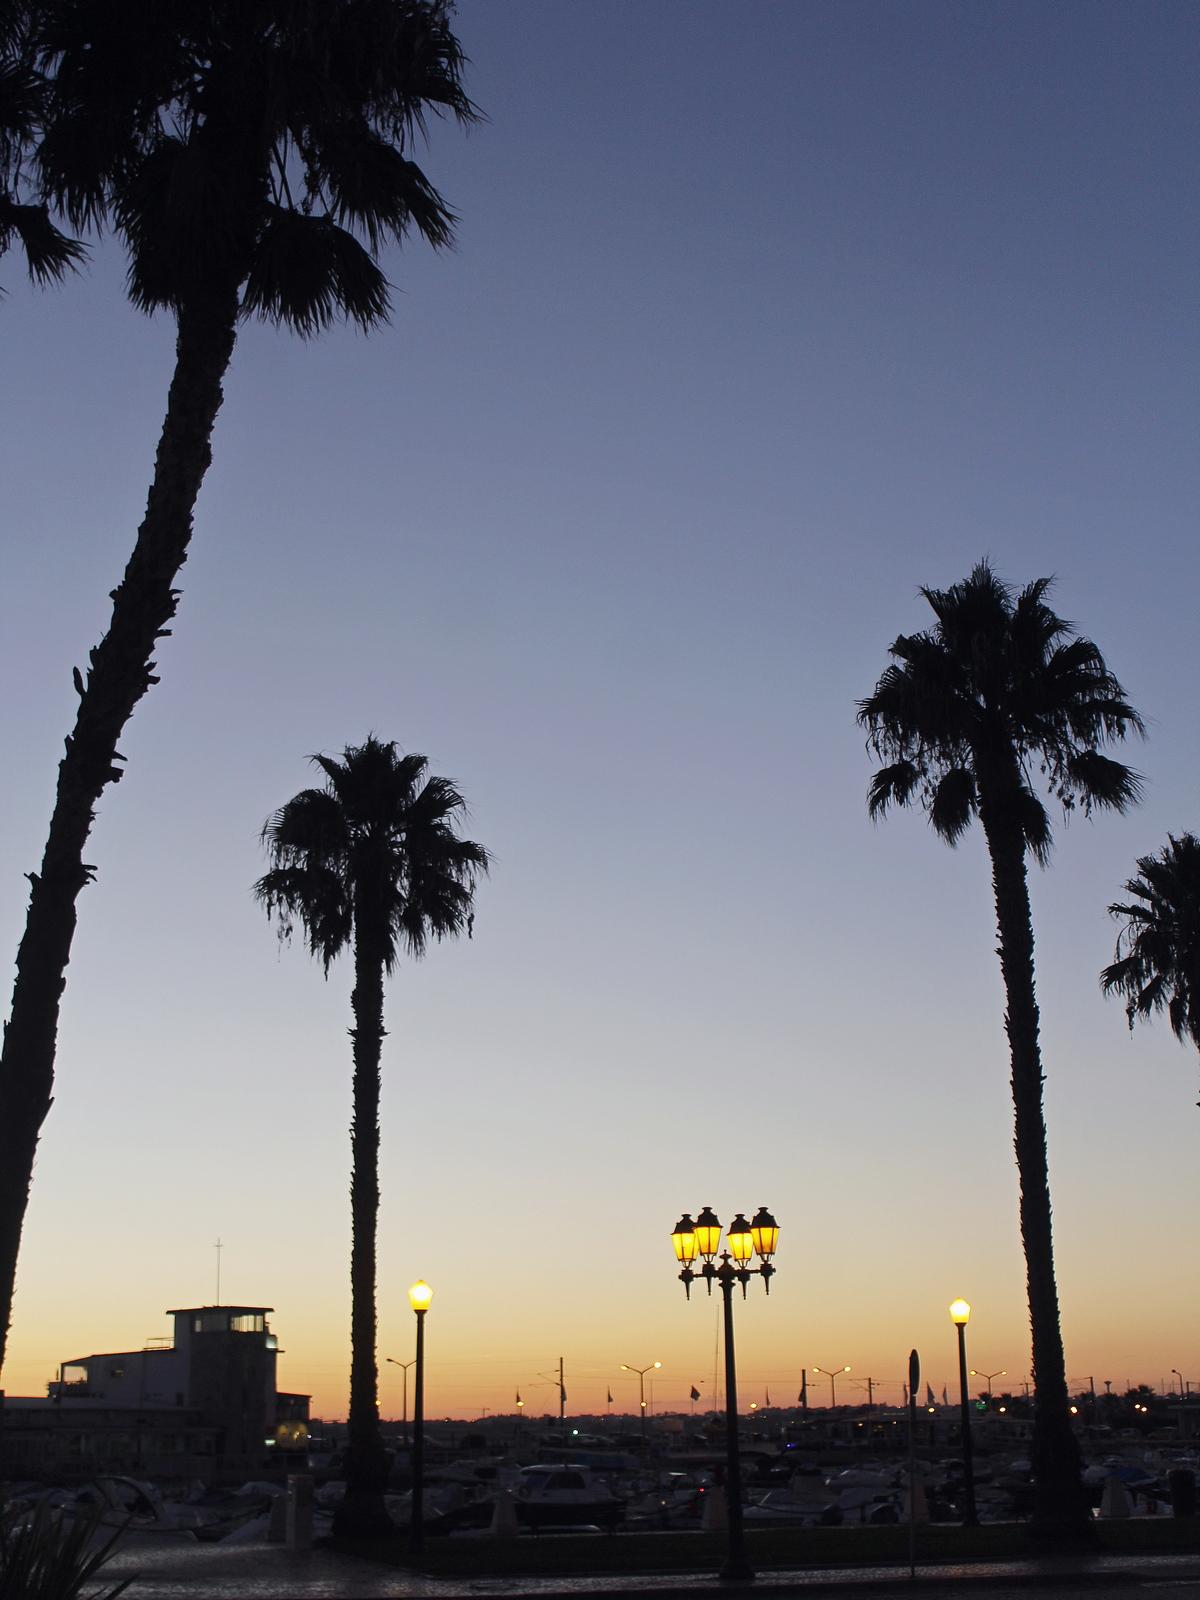 faro - port - plamtrees - palmiers - portugal